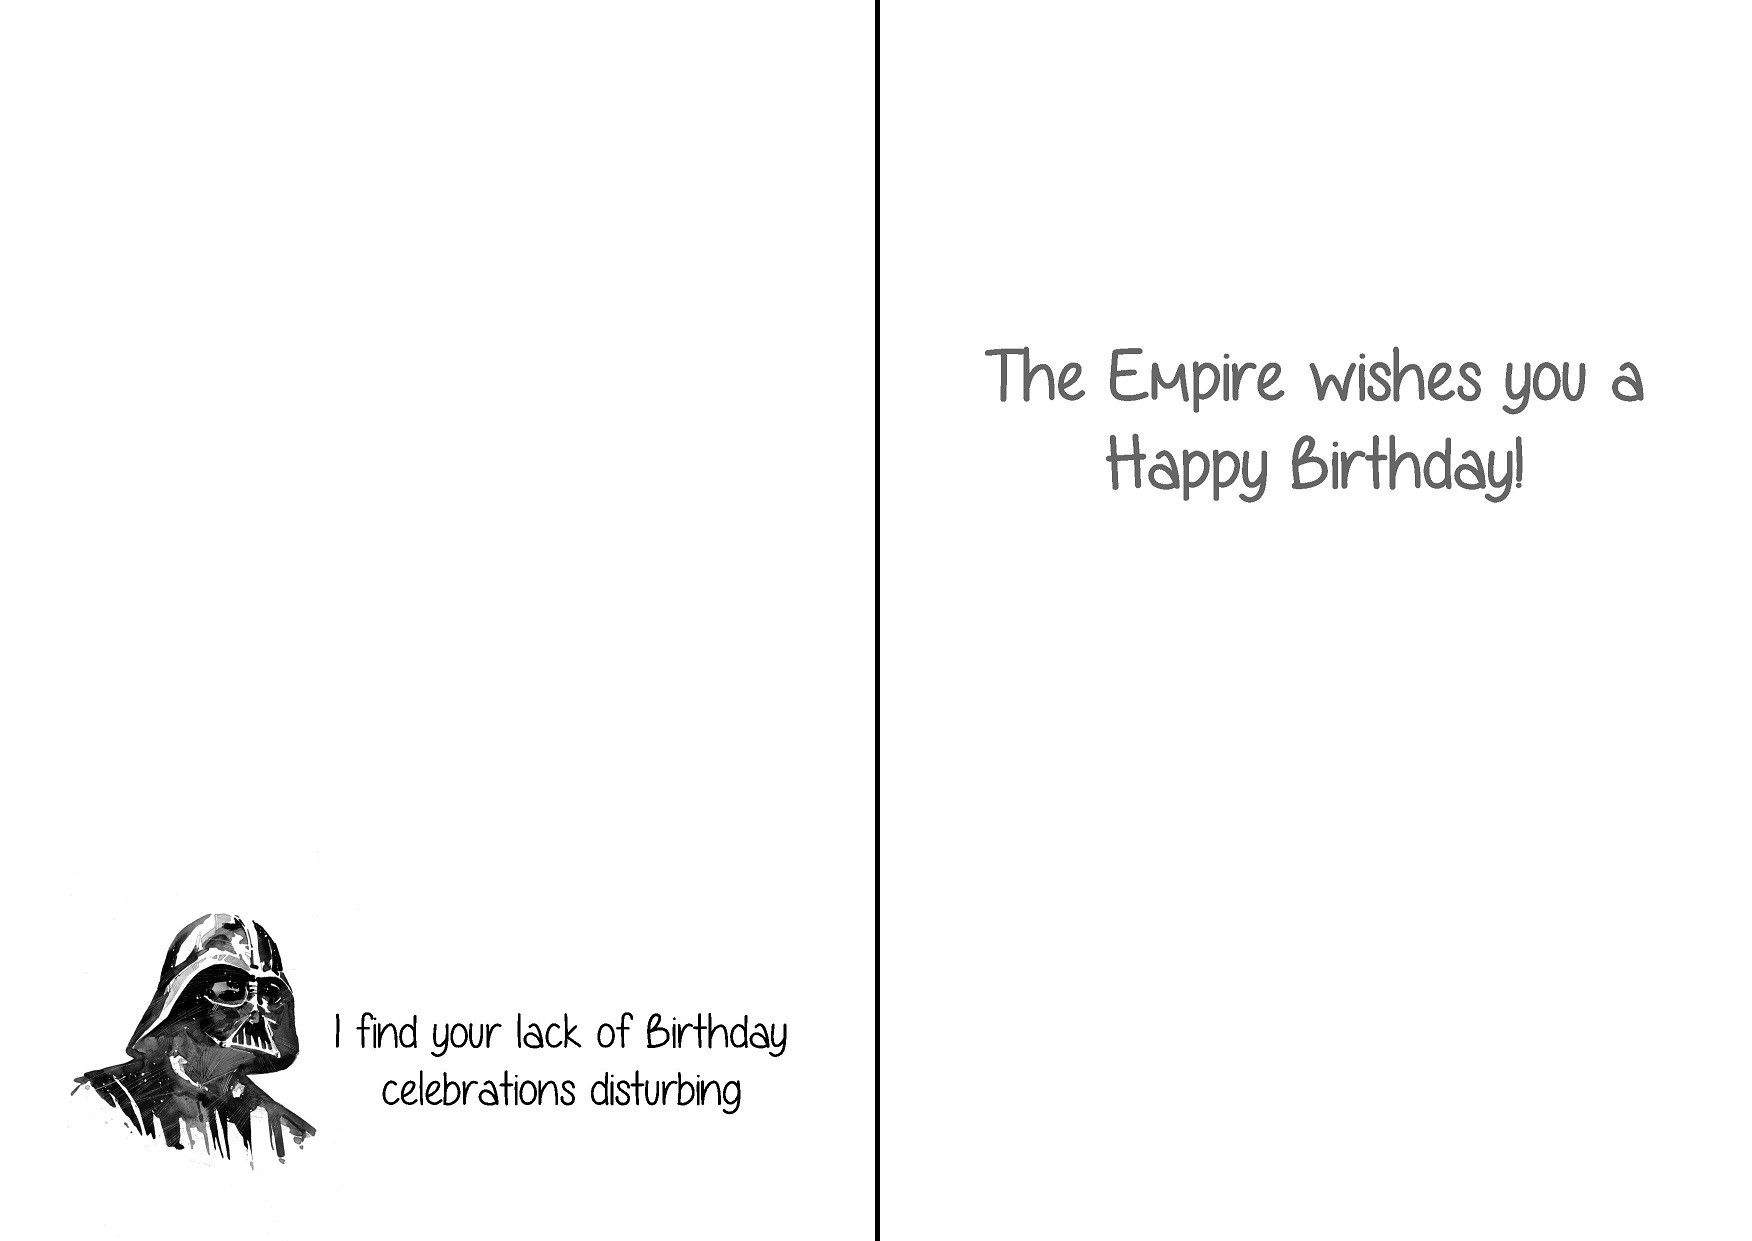 darth vader birthday card star wars pinterest darth vader birthday card bookmarktalkfo Gallery